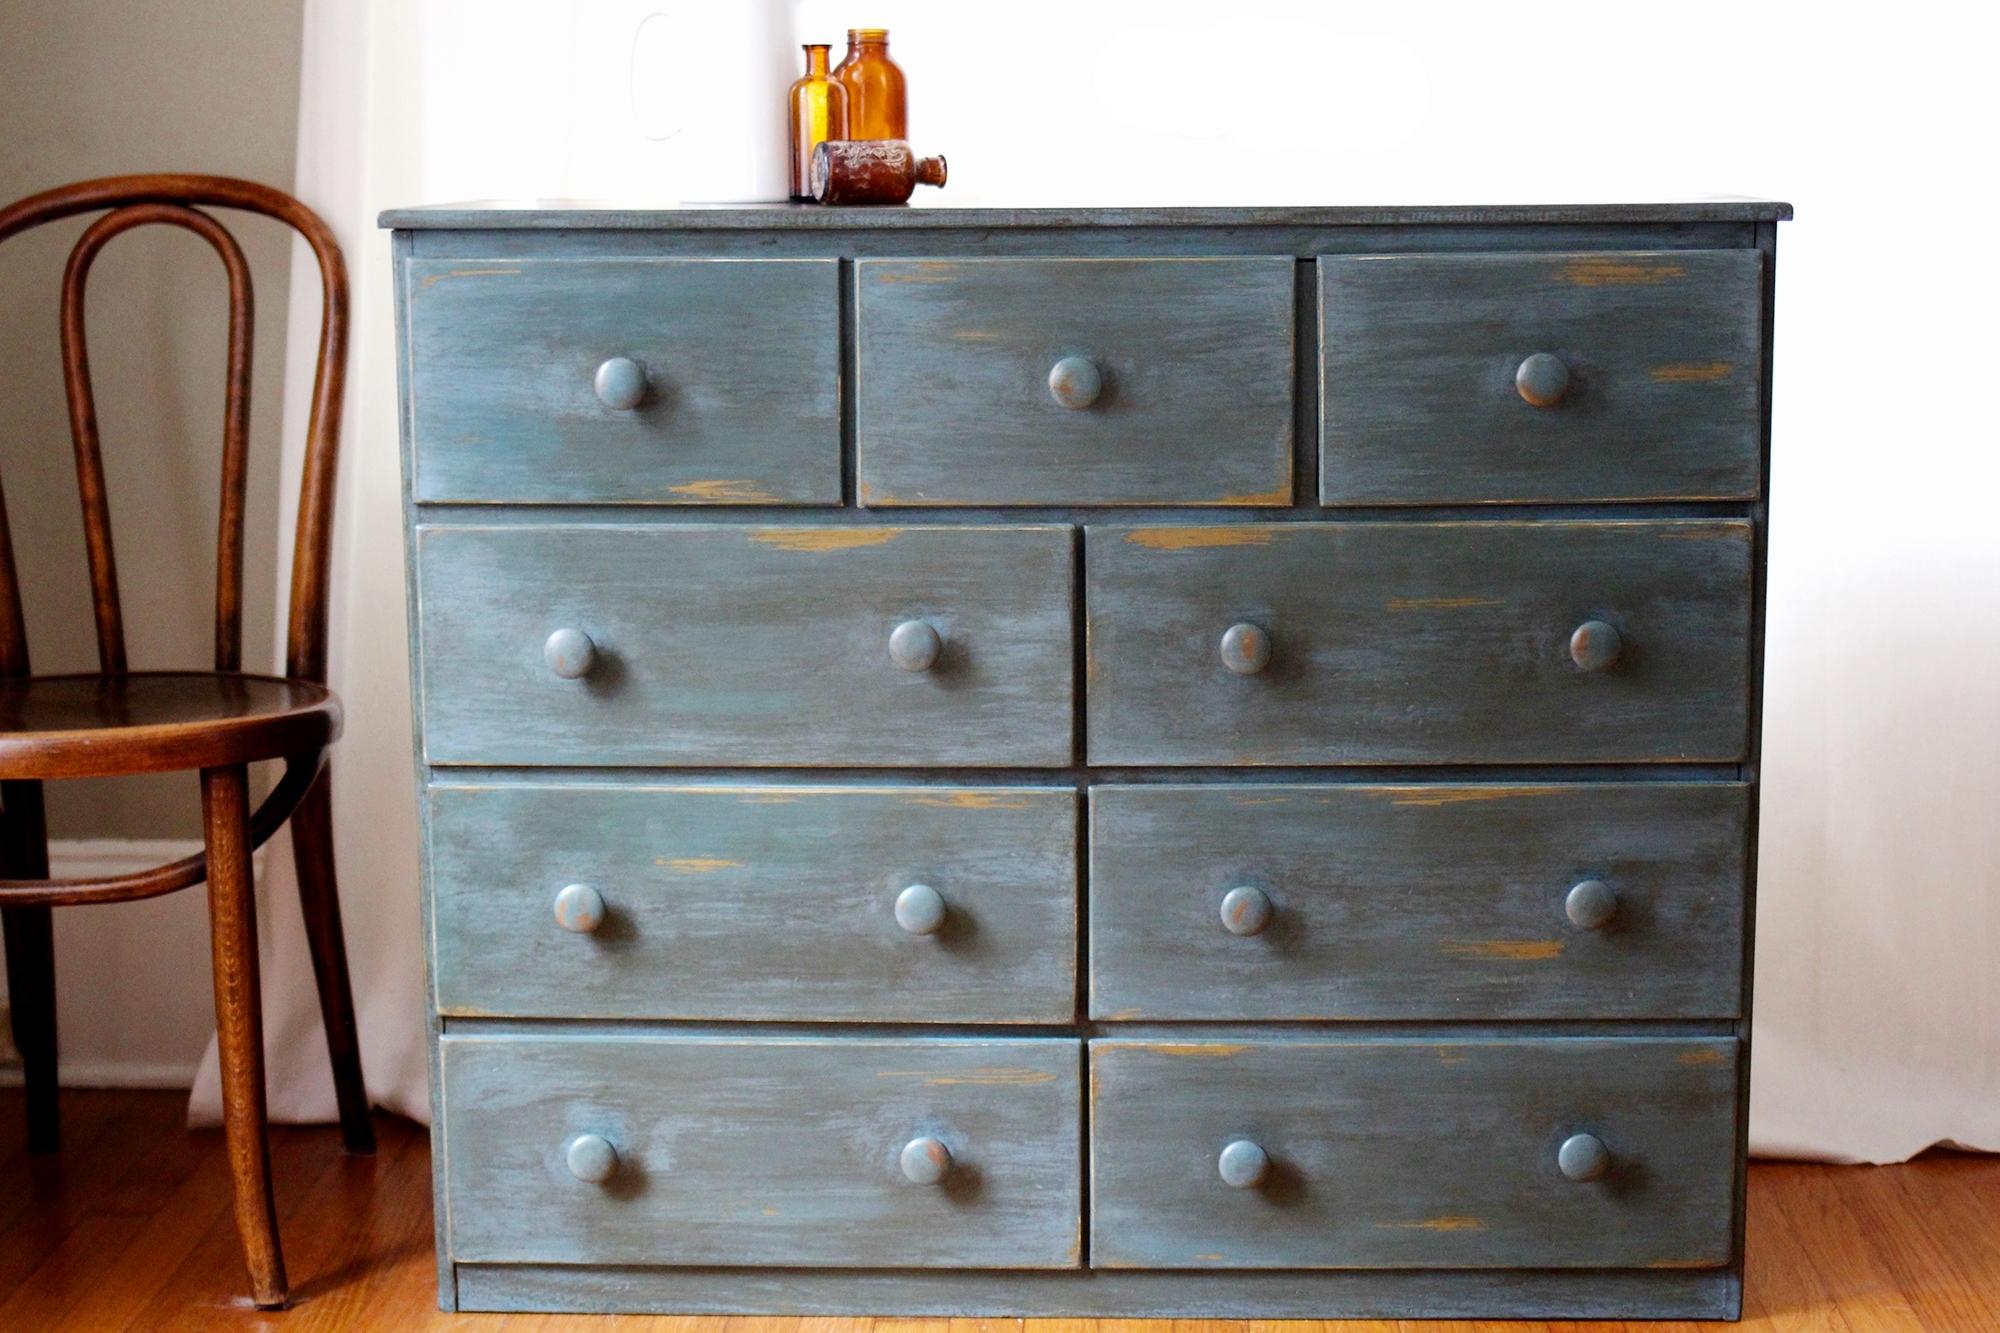 jo-torrijos-a-simpler-design-atlanta-interior-design-annie-sloan-aubusson-blue-chateau-gray-dresser-5.jpg